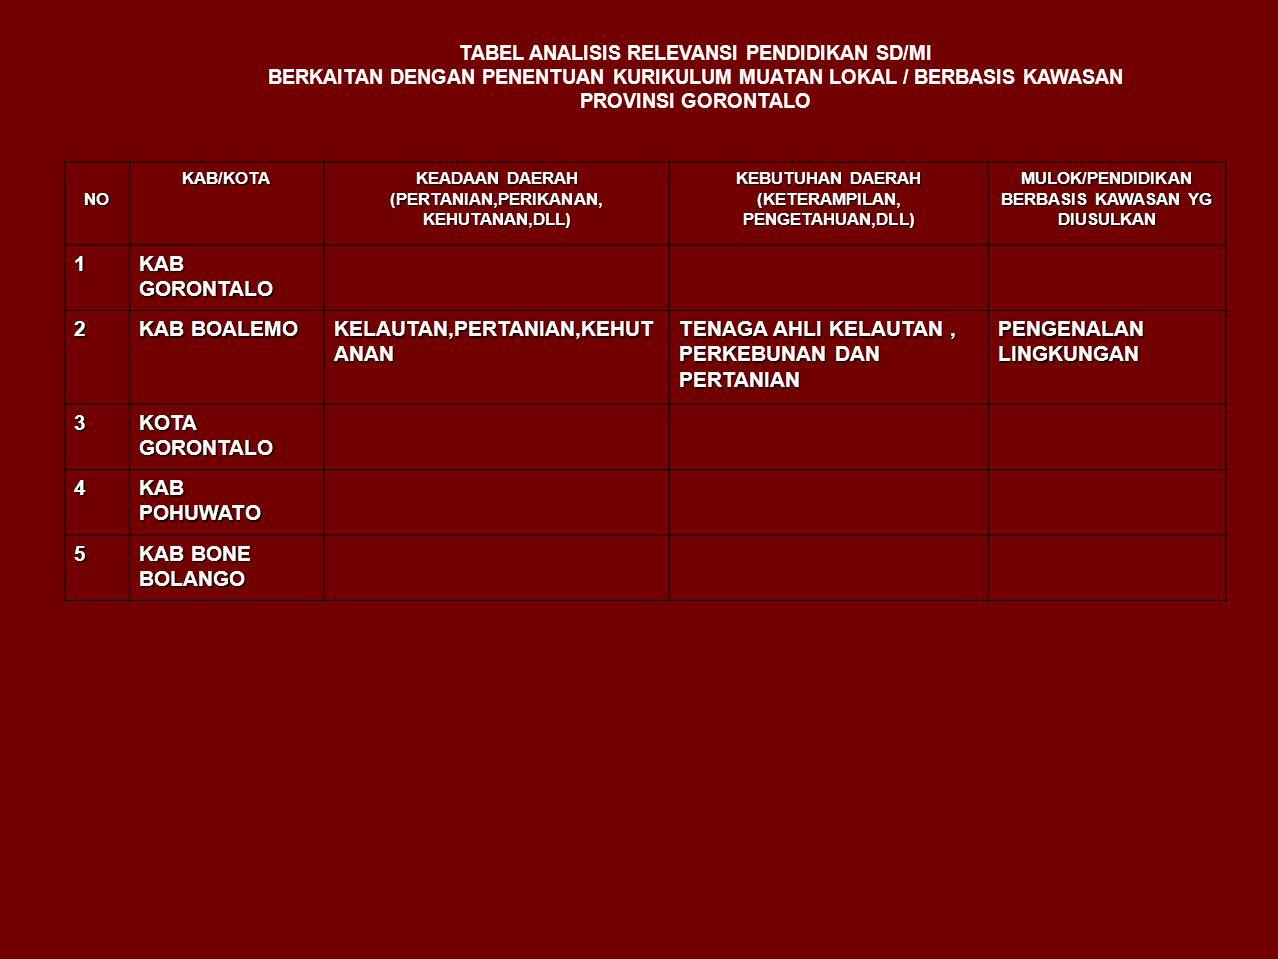 TABEL ANALISIS RELEVANSI PENDIDIKAN SD/MI BERKAITAN DENGAN PENENTUAN KURIKULUM MUATAN LOKAL / BERBASIS KAWASAN PROVINSI GORONTALO NOKAB/KOTA KEADAAN D